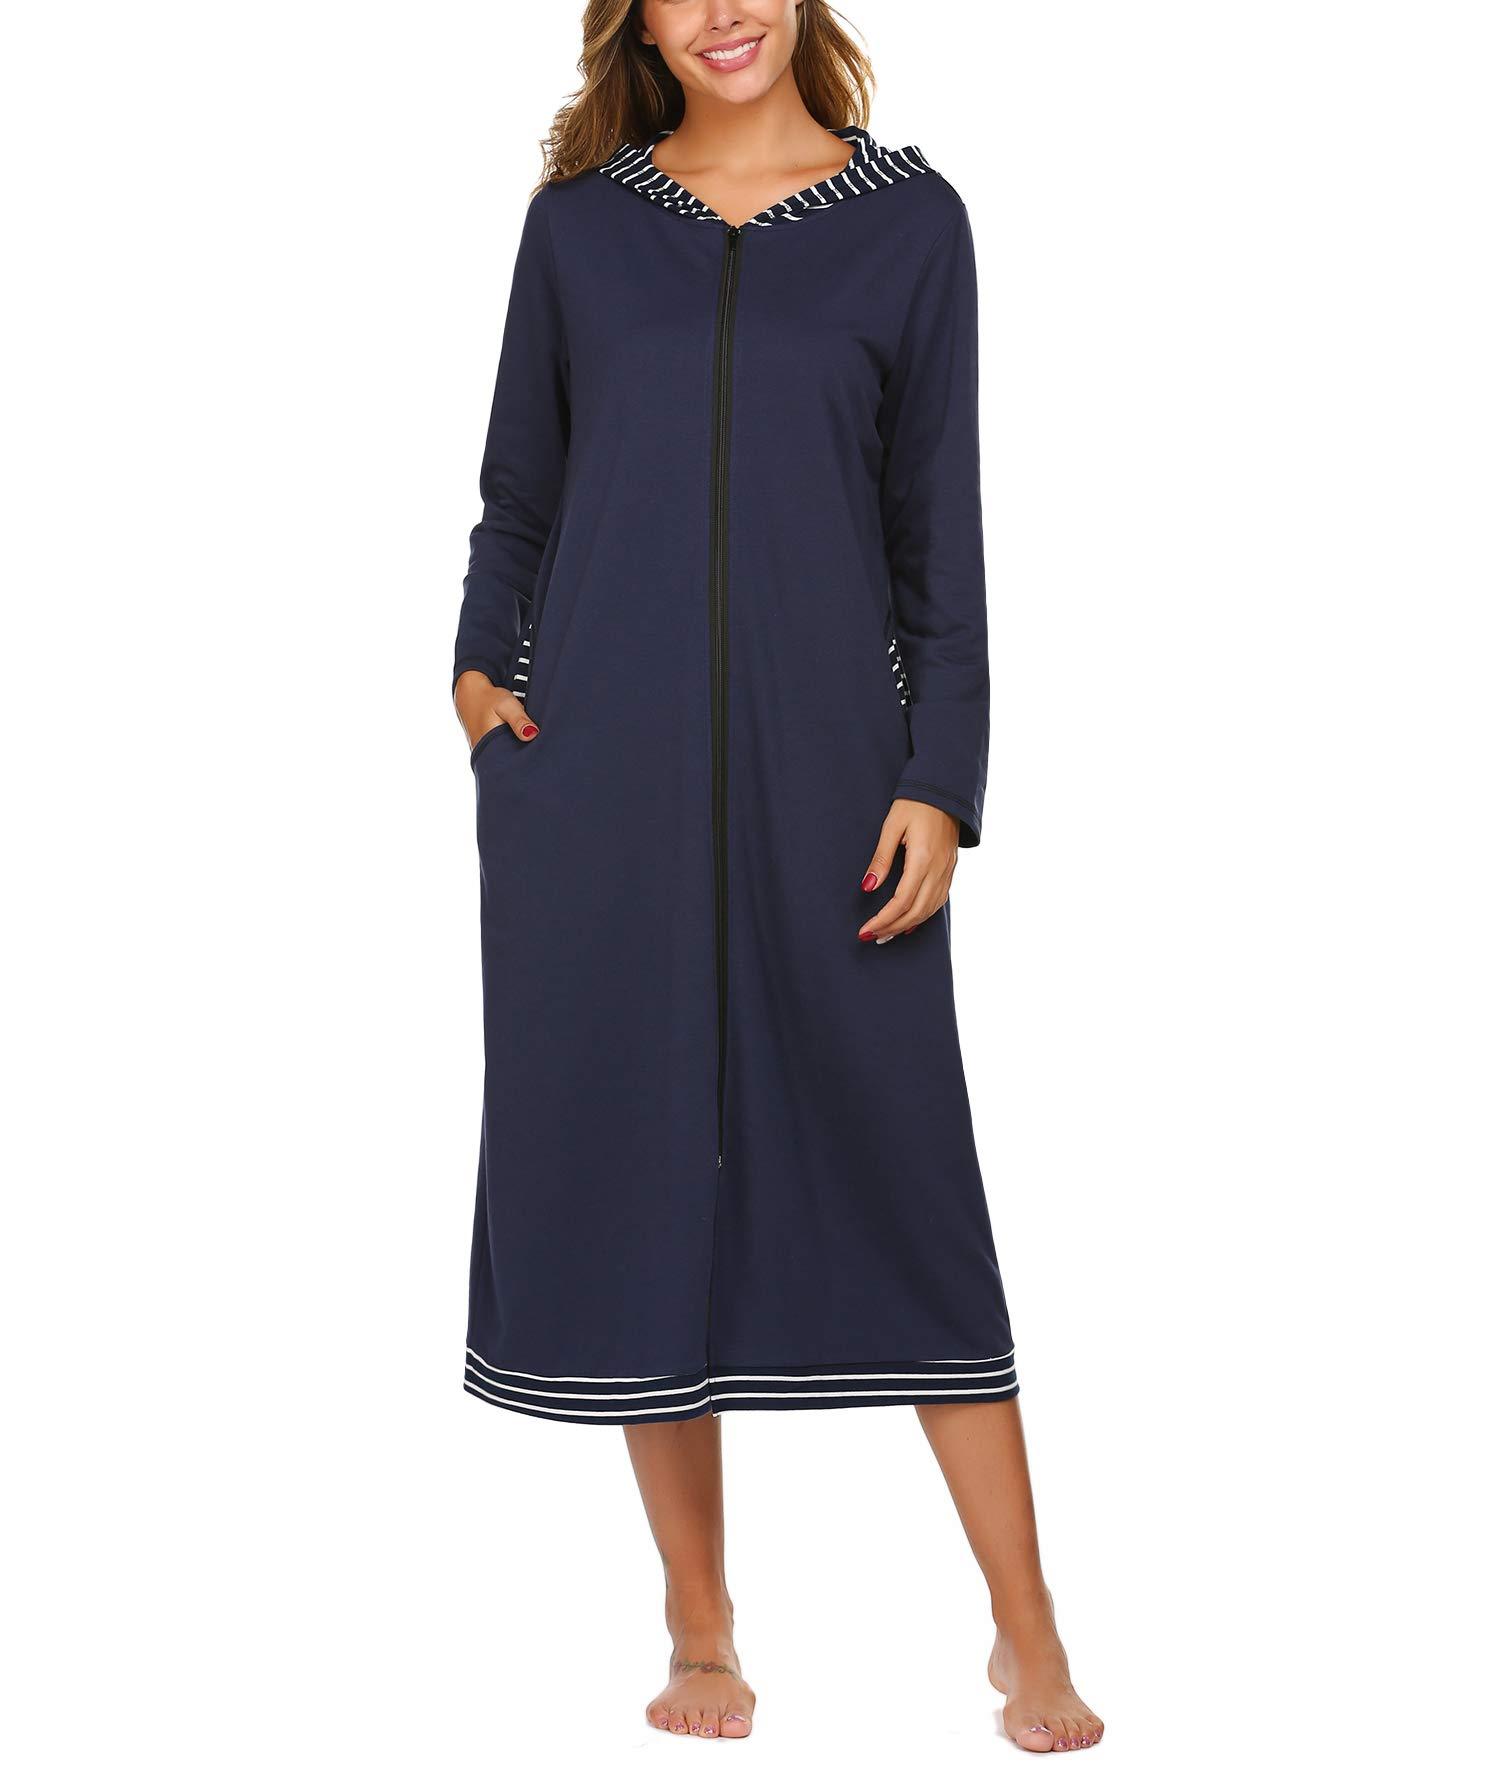 luxilooks Nightgown Womens Button Down Nightshirt Short Sleeve Night Gown with Pockets Sleepwear S-XXL